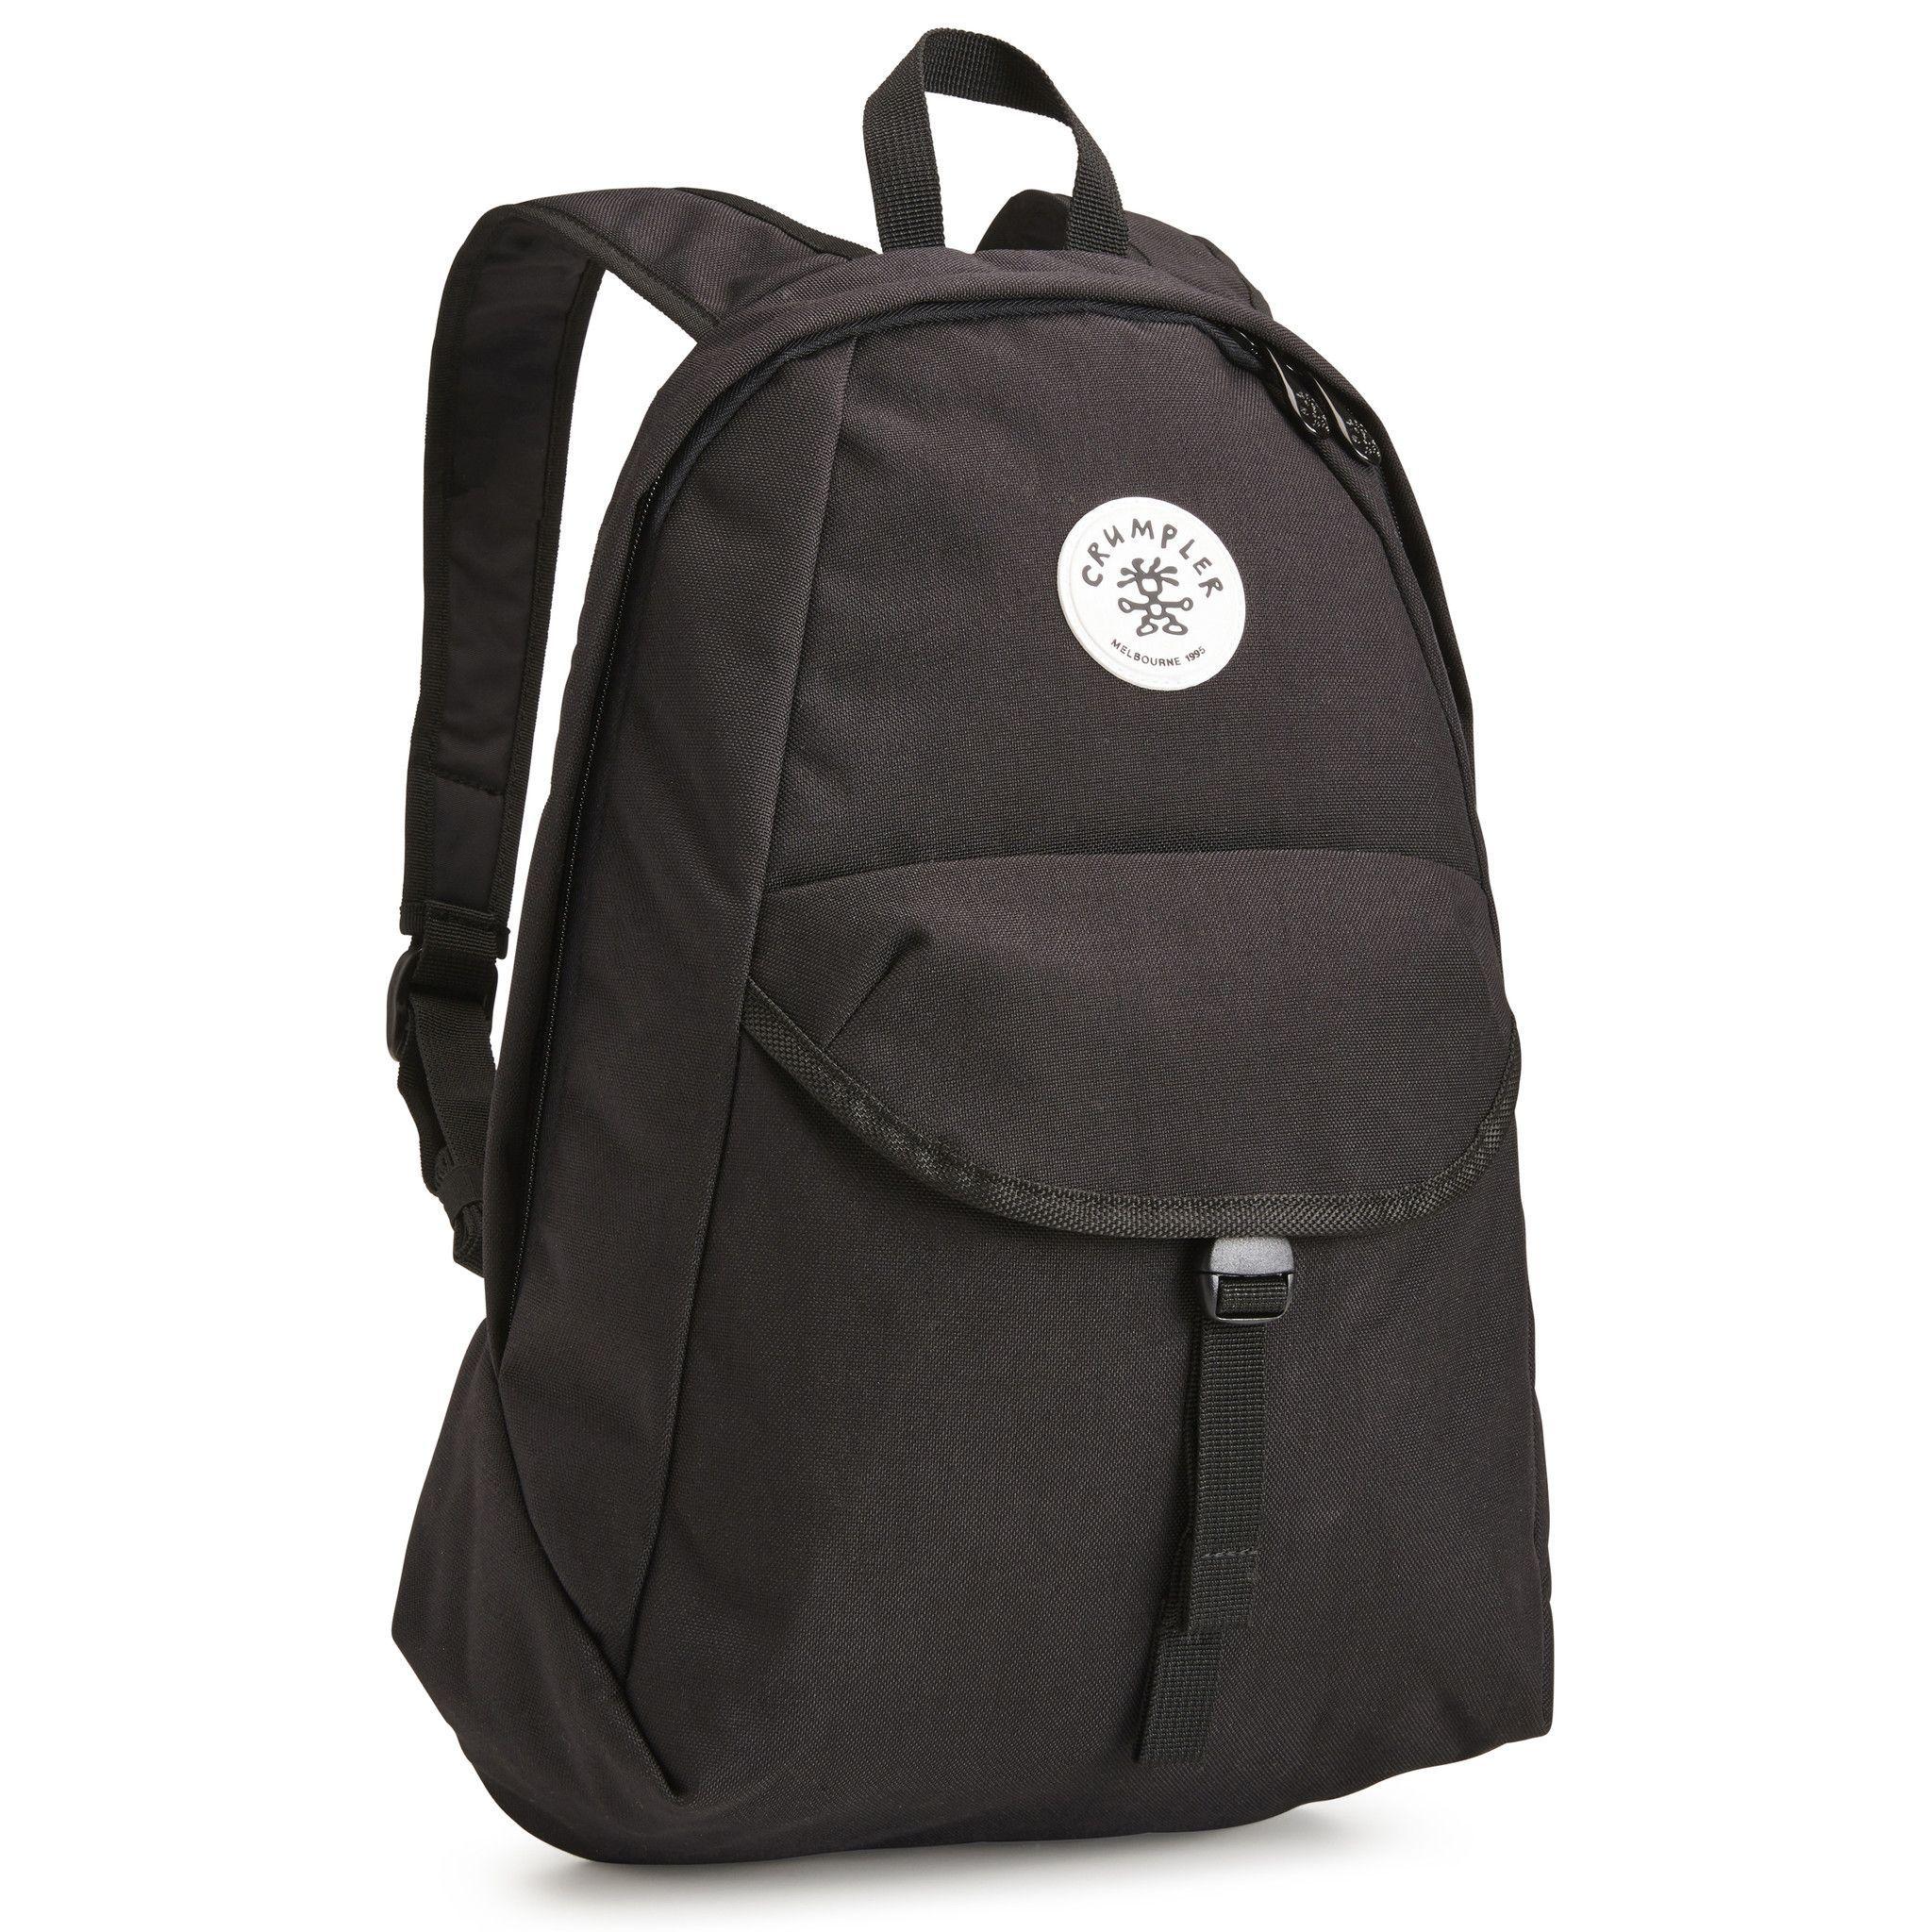 mk backpacks at ross rh lcpowerbuy com